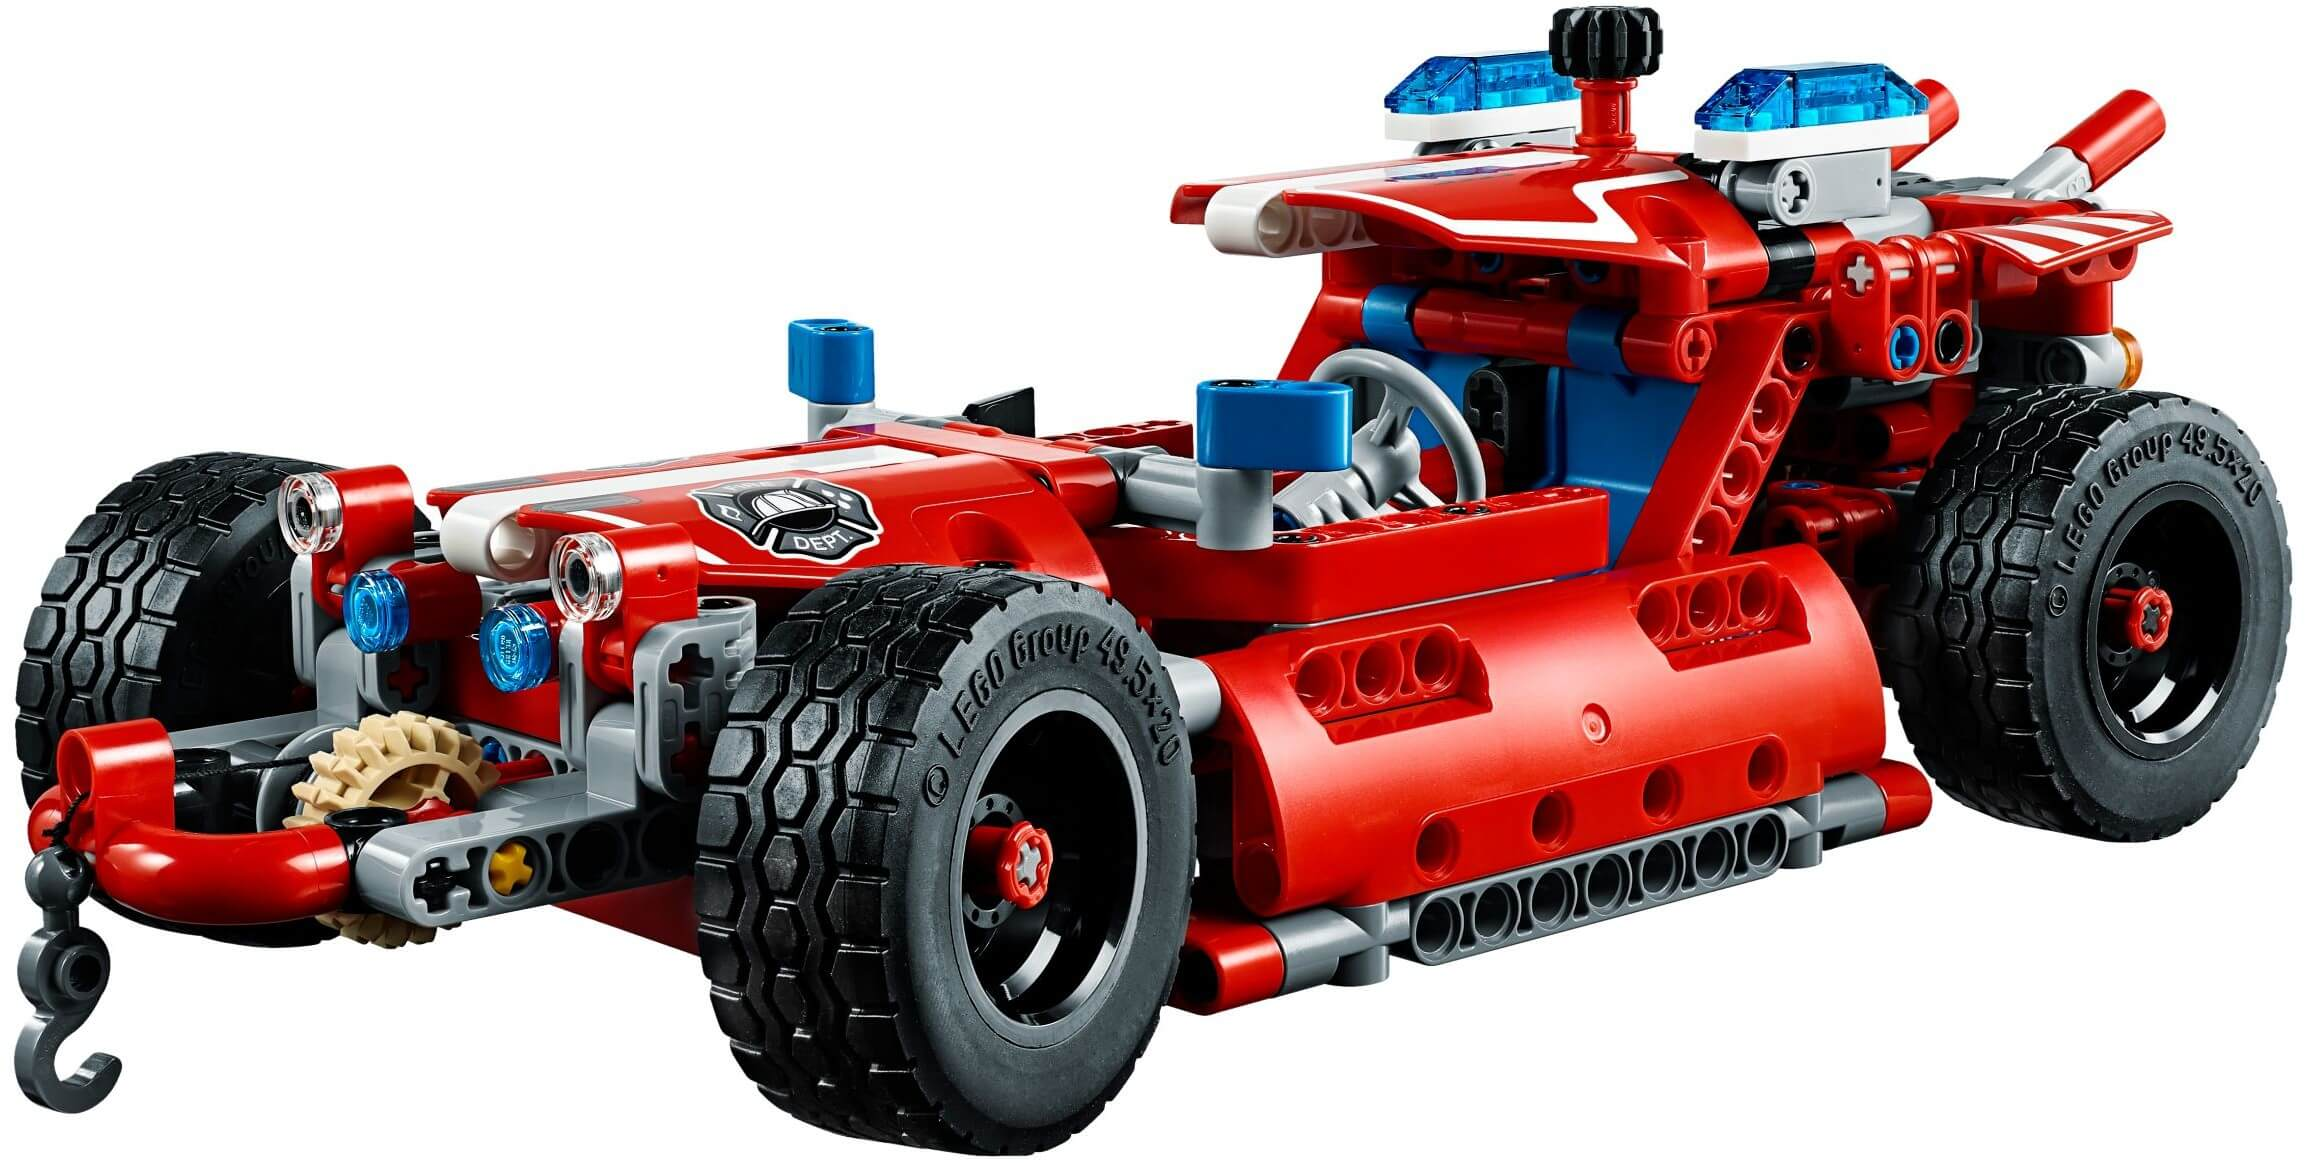 Mua đồ chơi LEGO 42075 - LEGO Technic 42075 - Xe Cứu Hỏa (LEGO Technic 42075 First Responder)